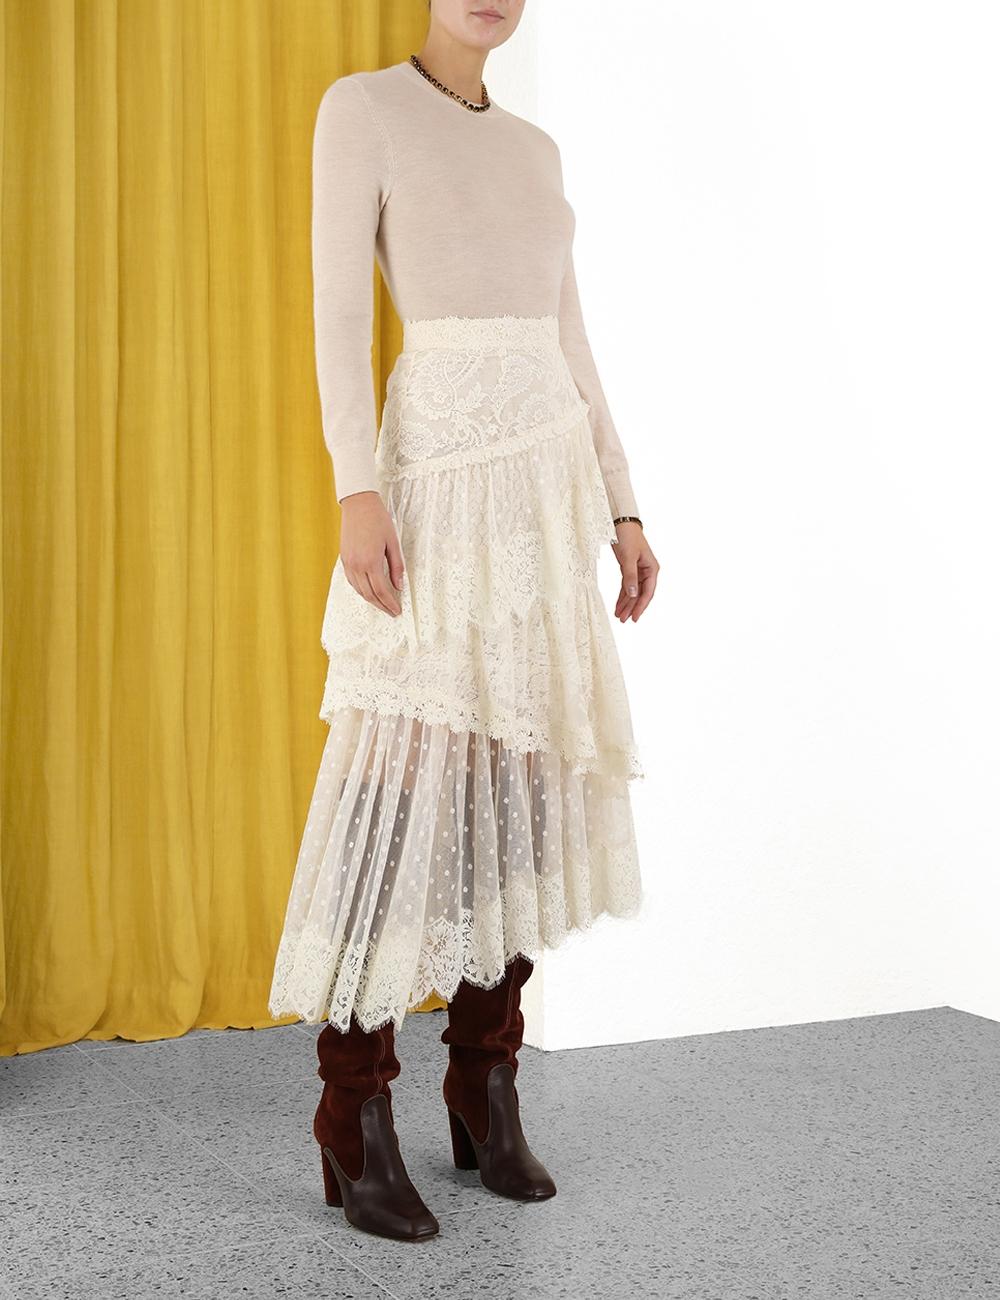 Concert Textured Lace Skirt